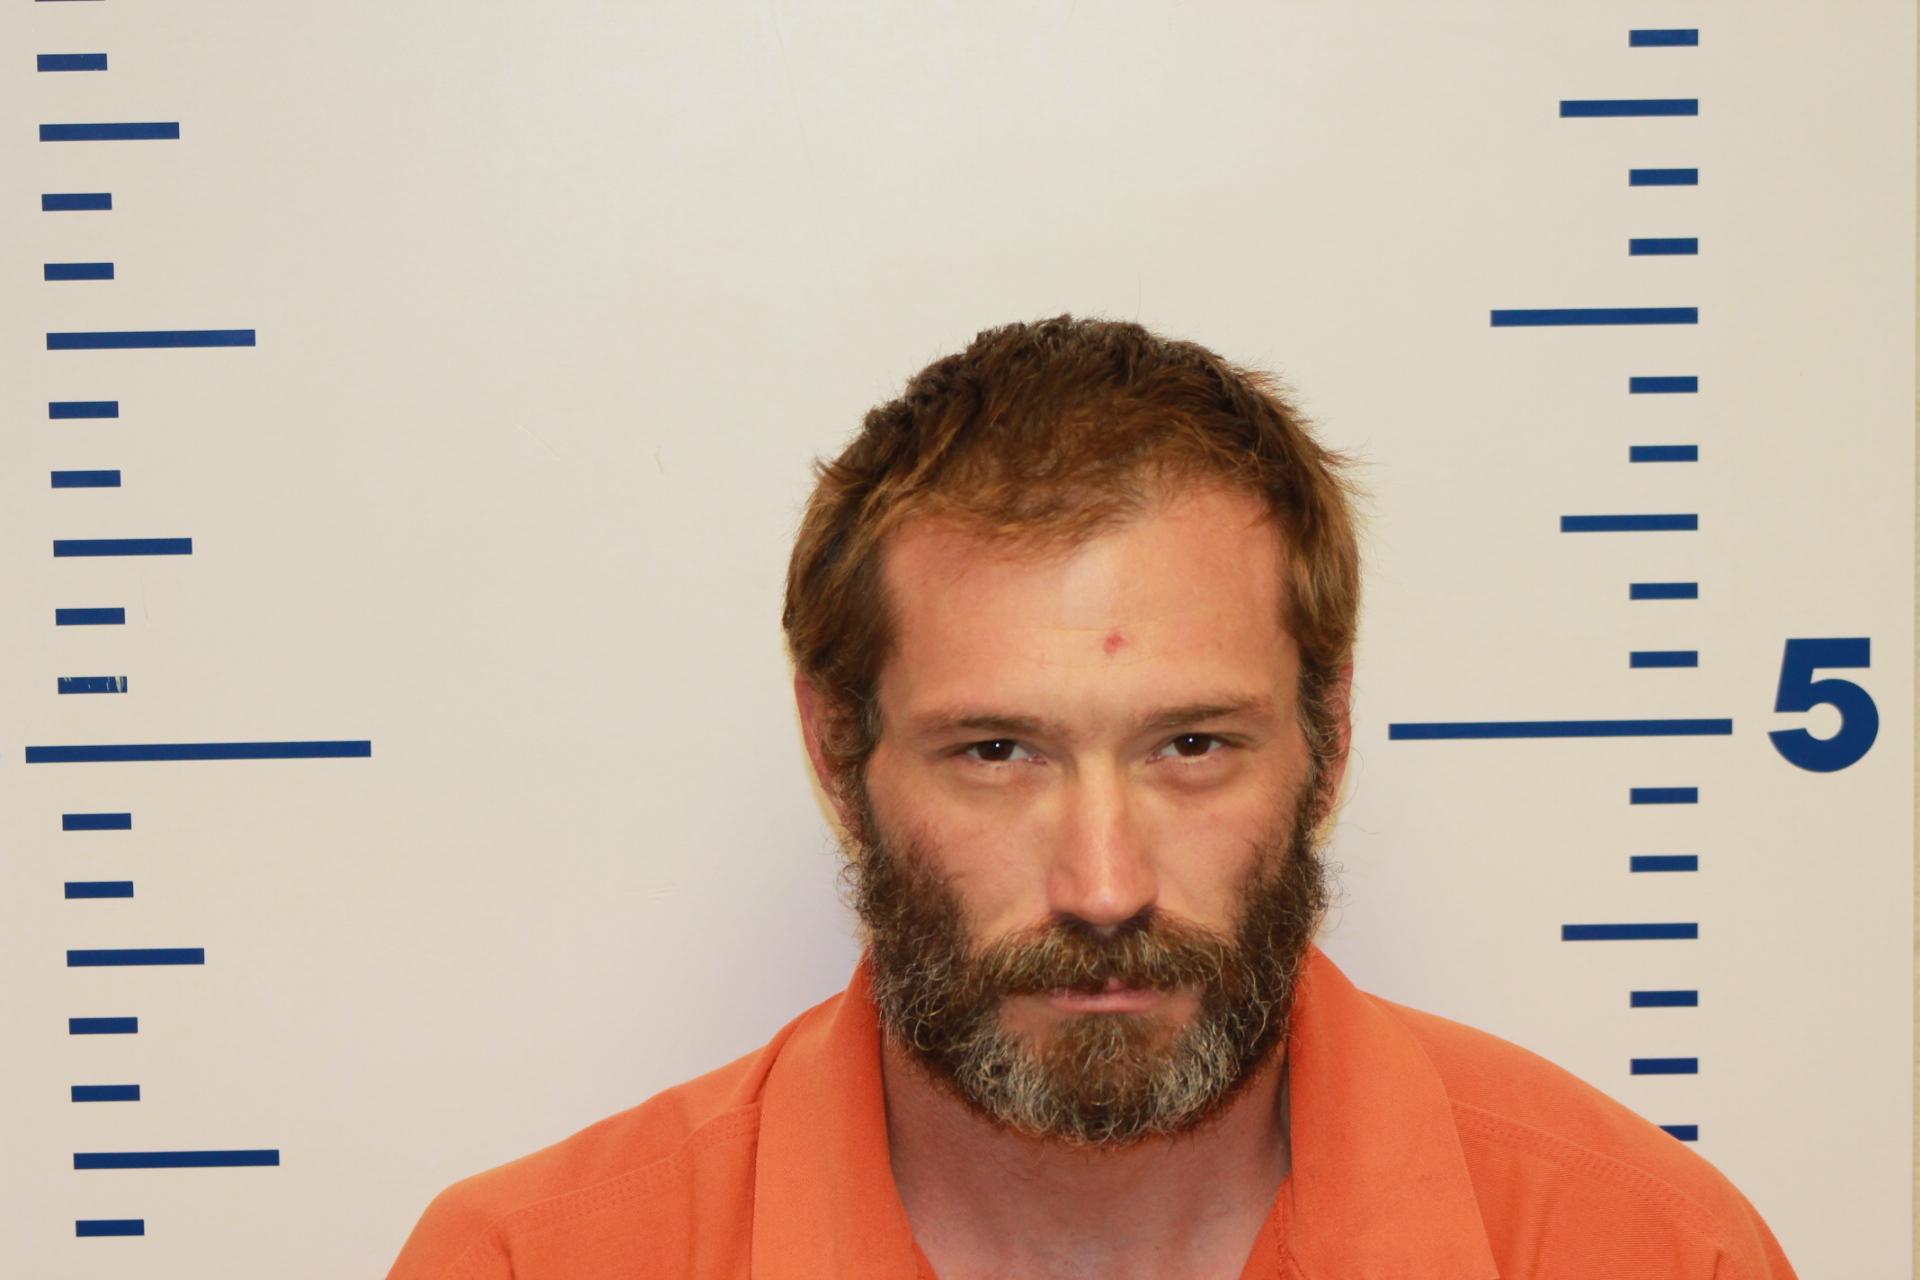 Christopher Wade Sheldon, Logan County Jail